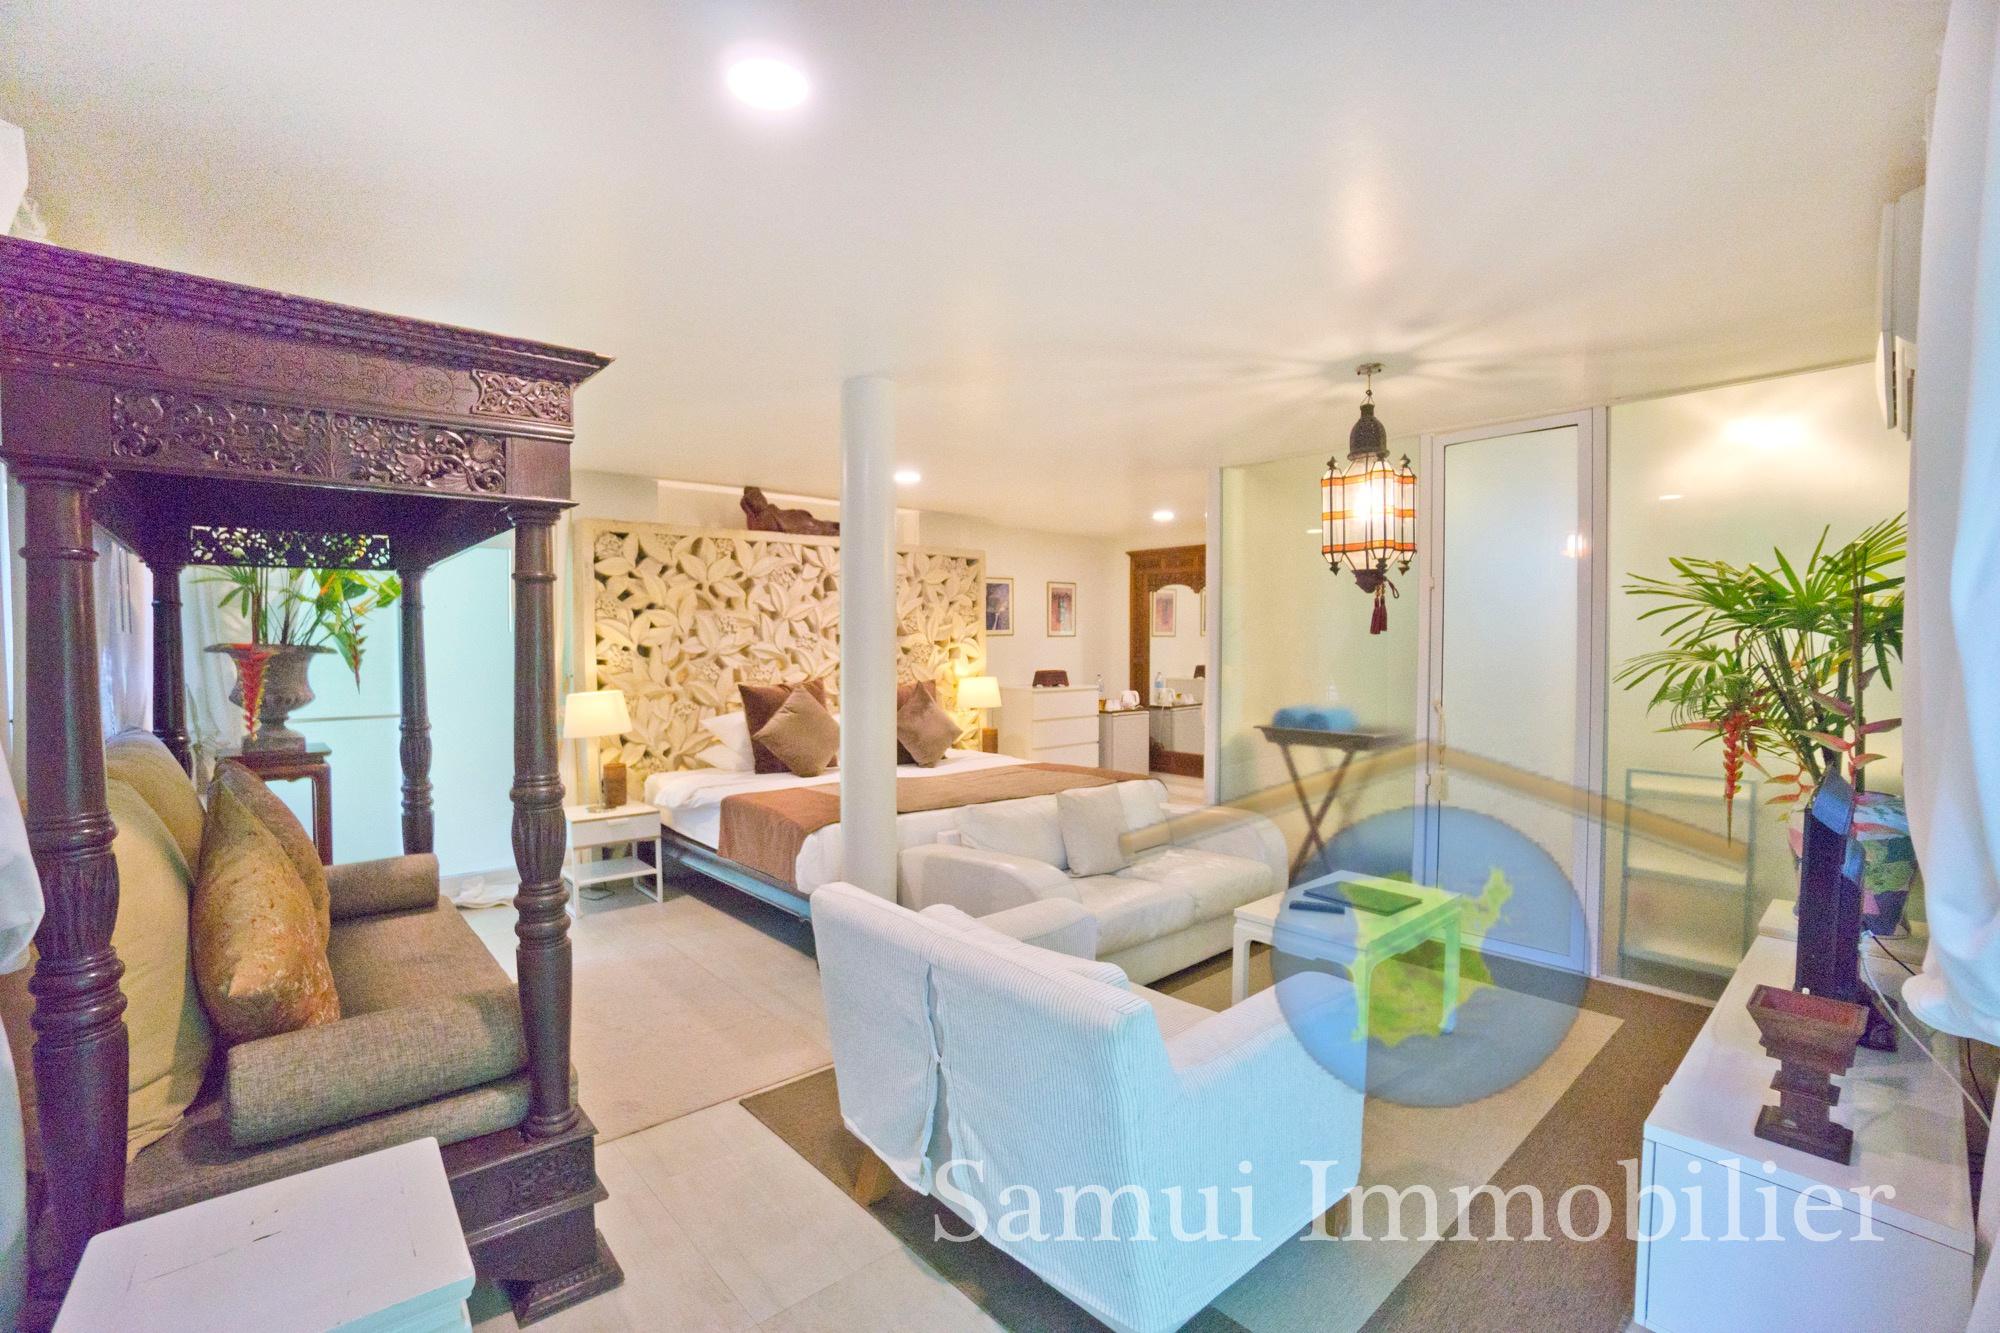 3 villas and restaurant for sale - 6 bedrooms - Bophut